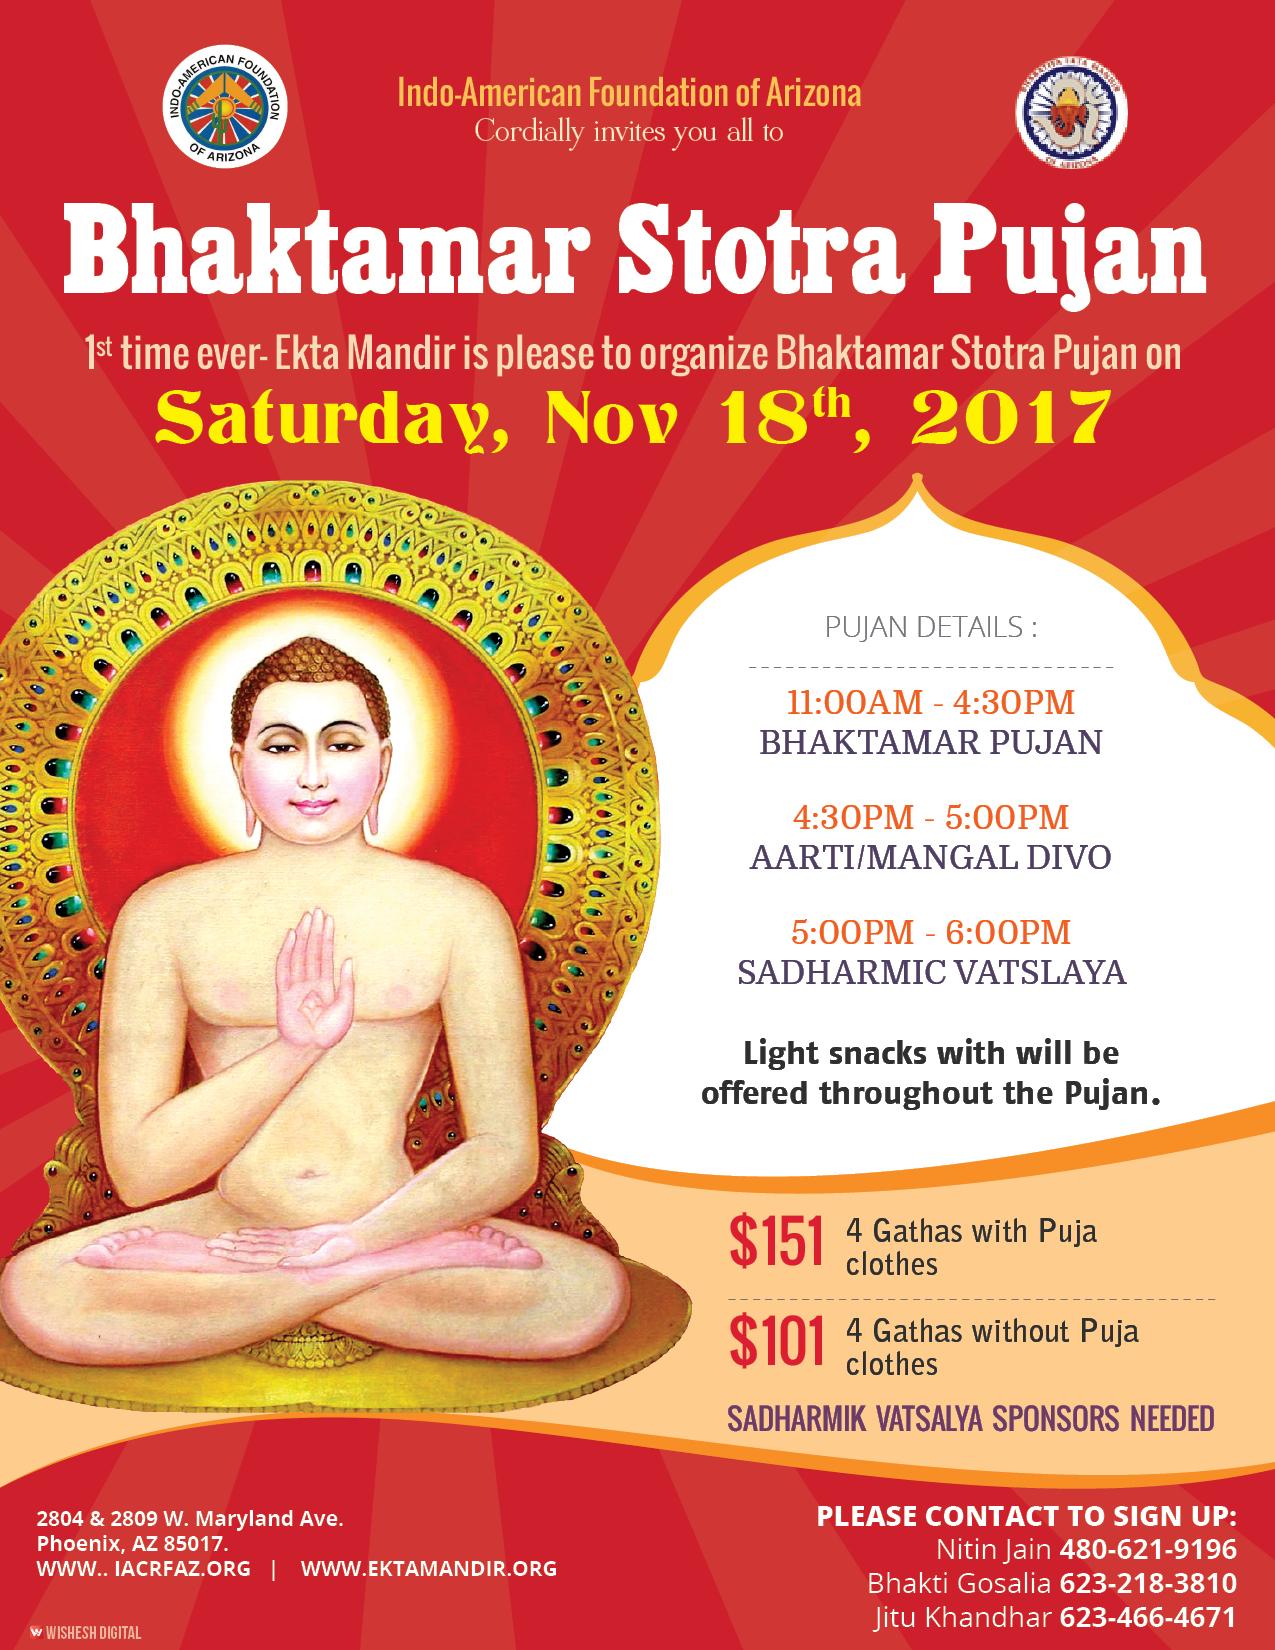 Bhaktamar Stotra Pujan